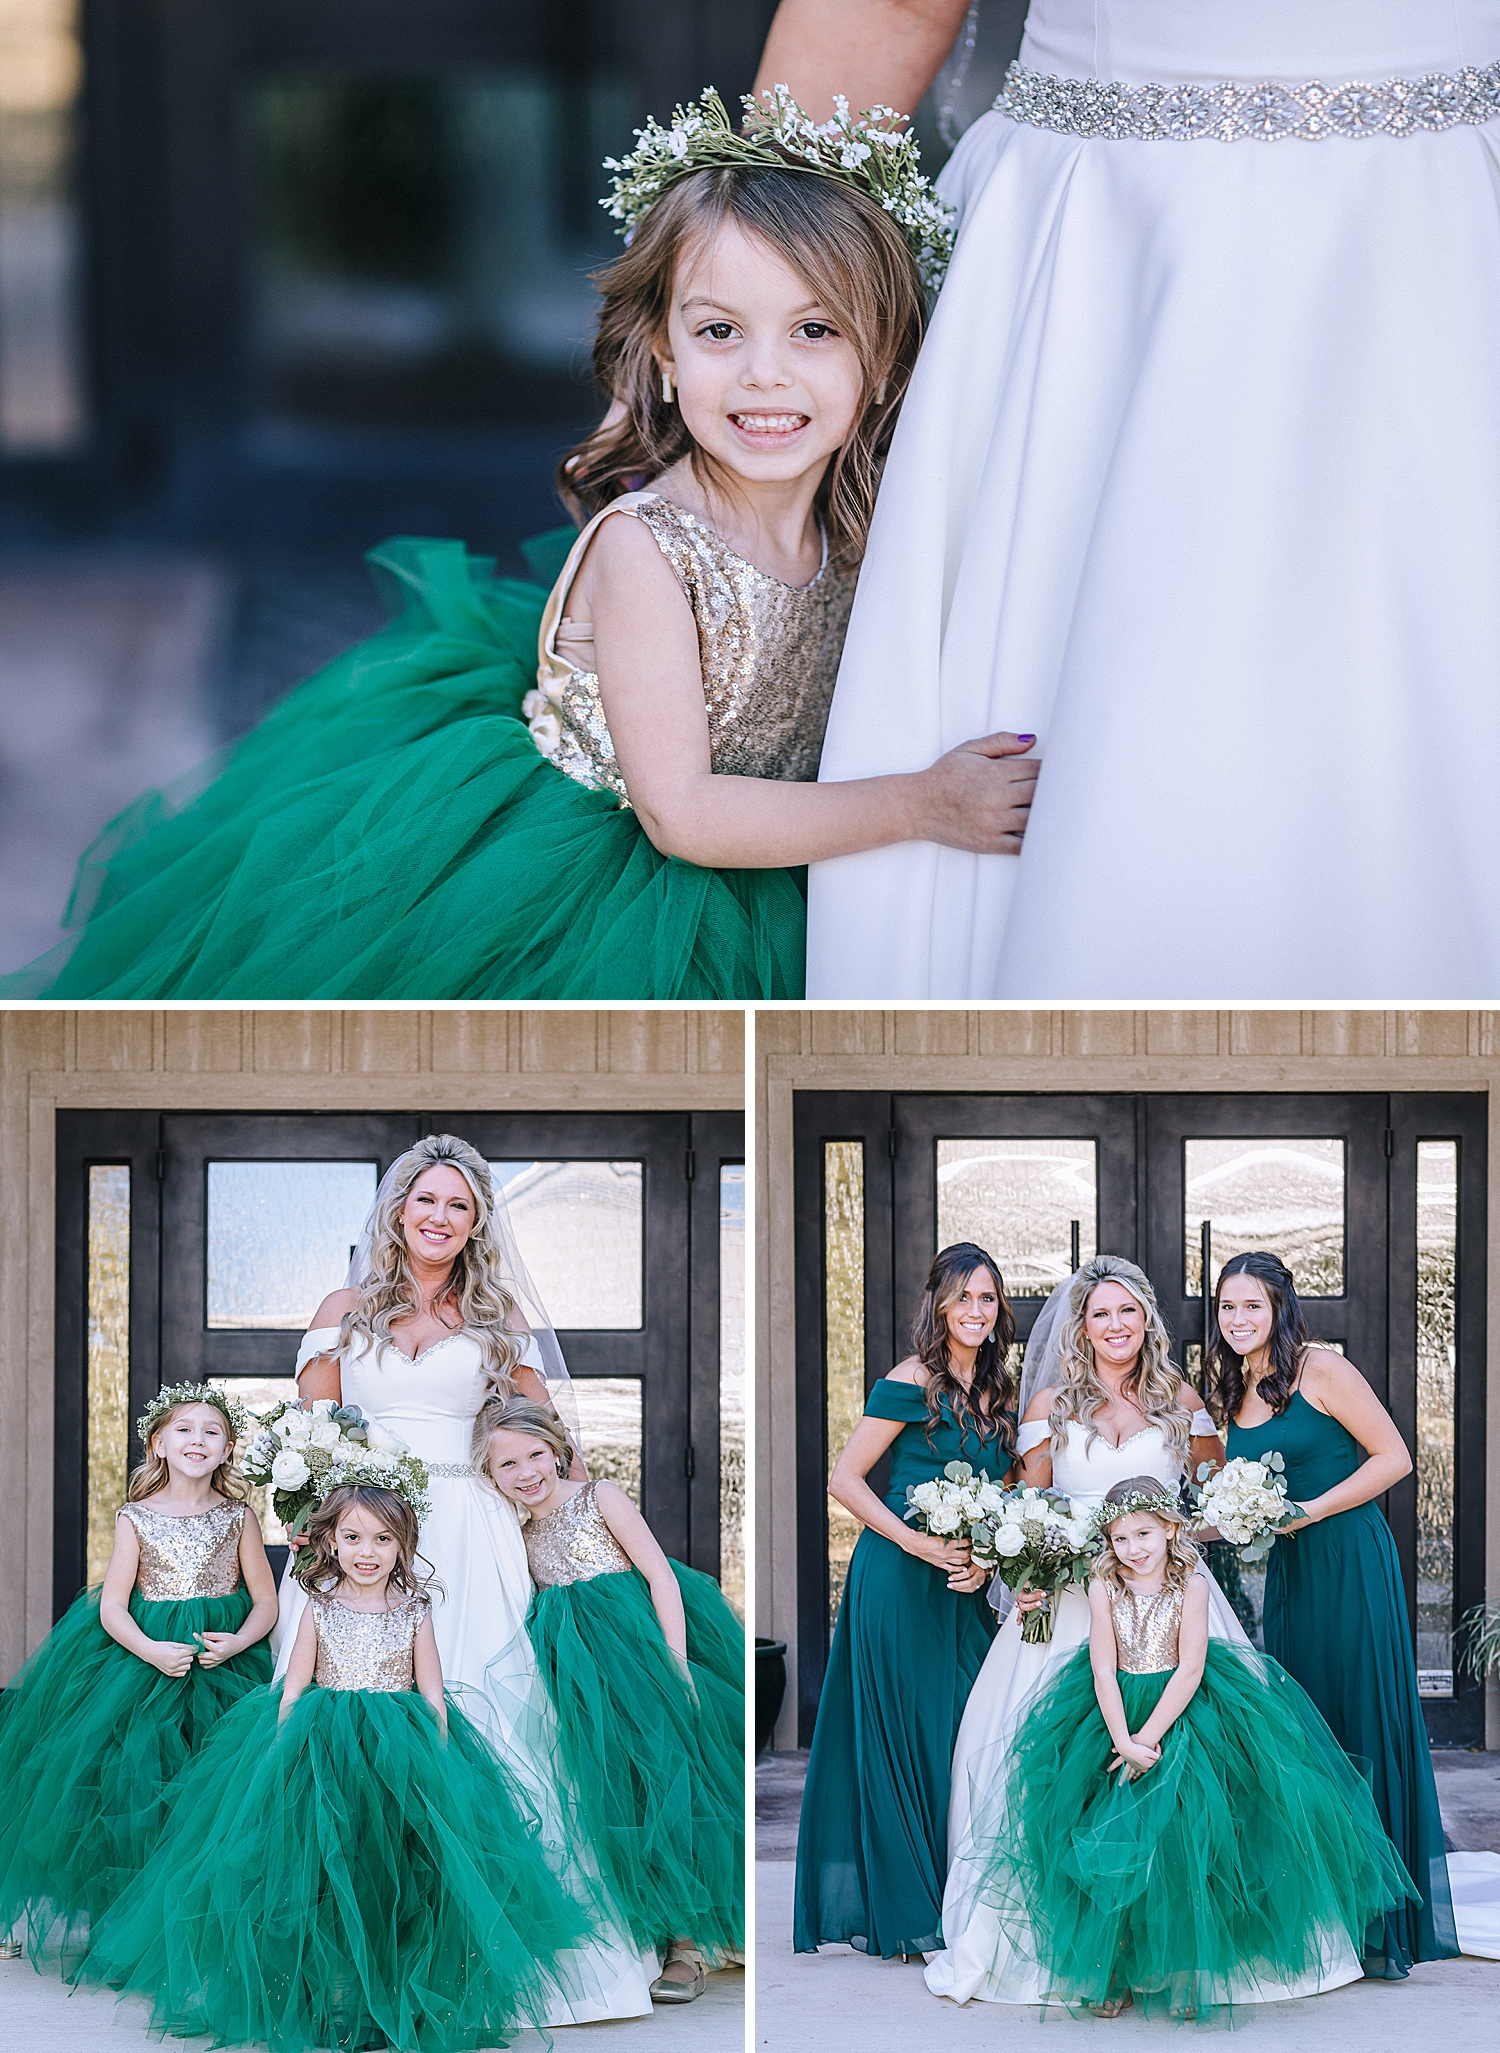 Magnolia-Halle-Wedding-San-Antonio-Texas-Bride-Grom_0036.jpg